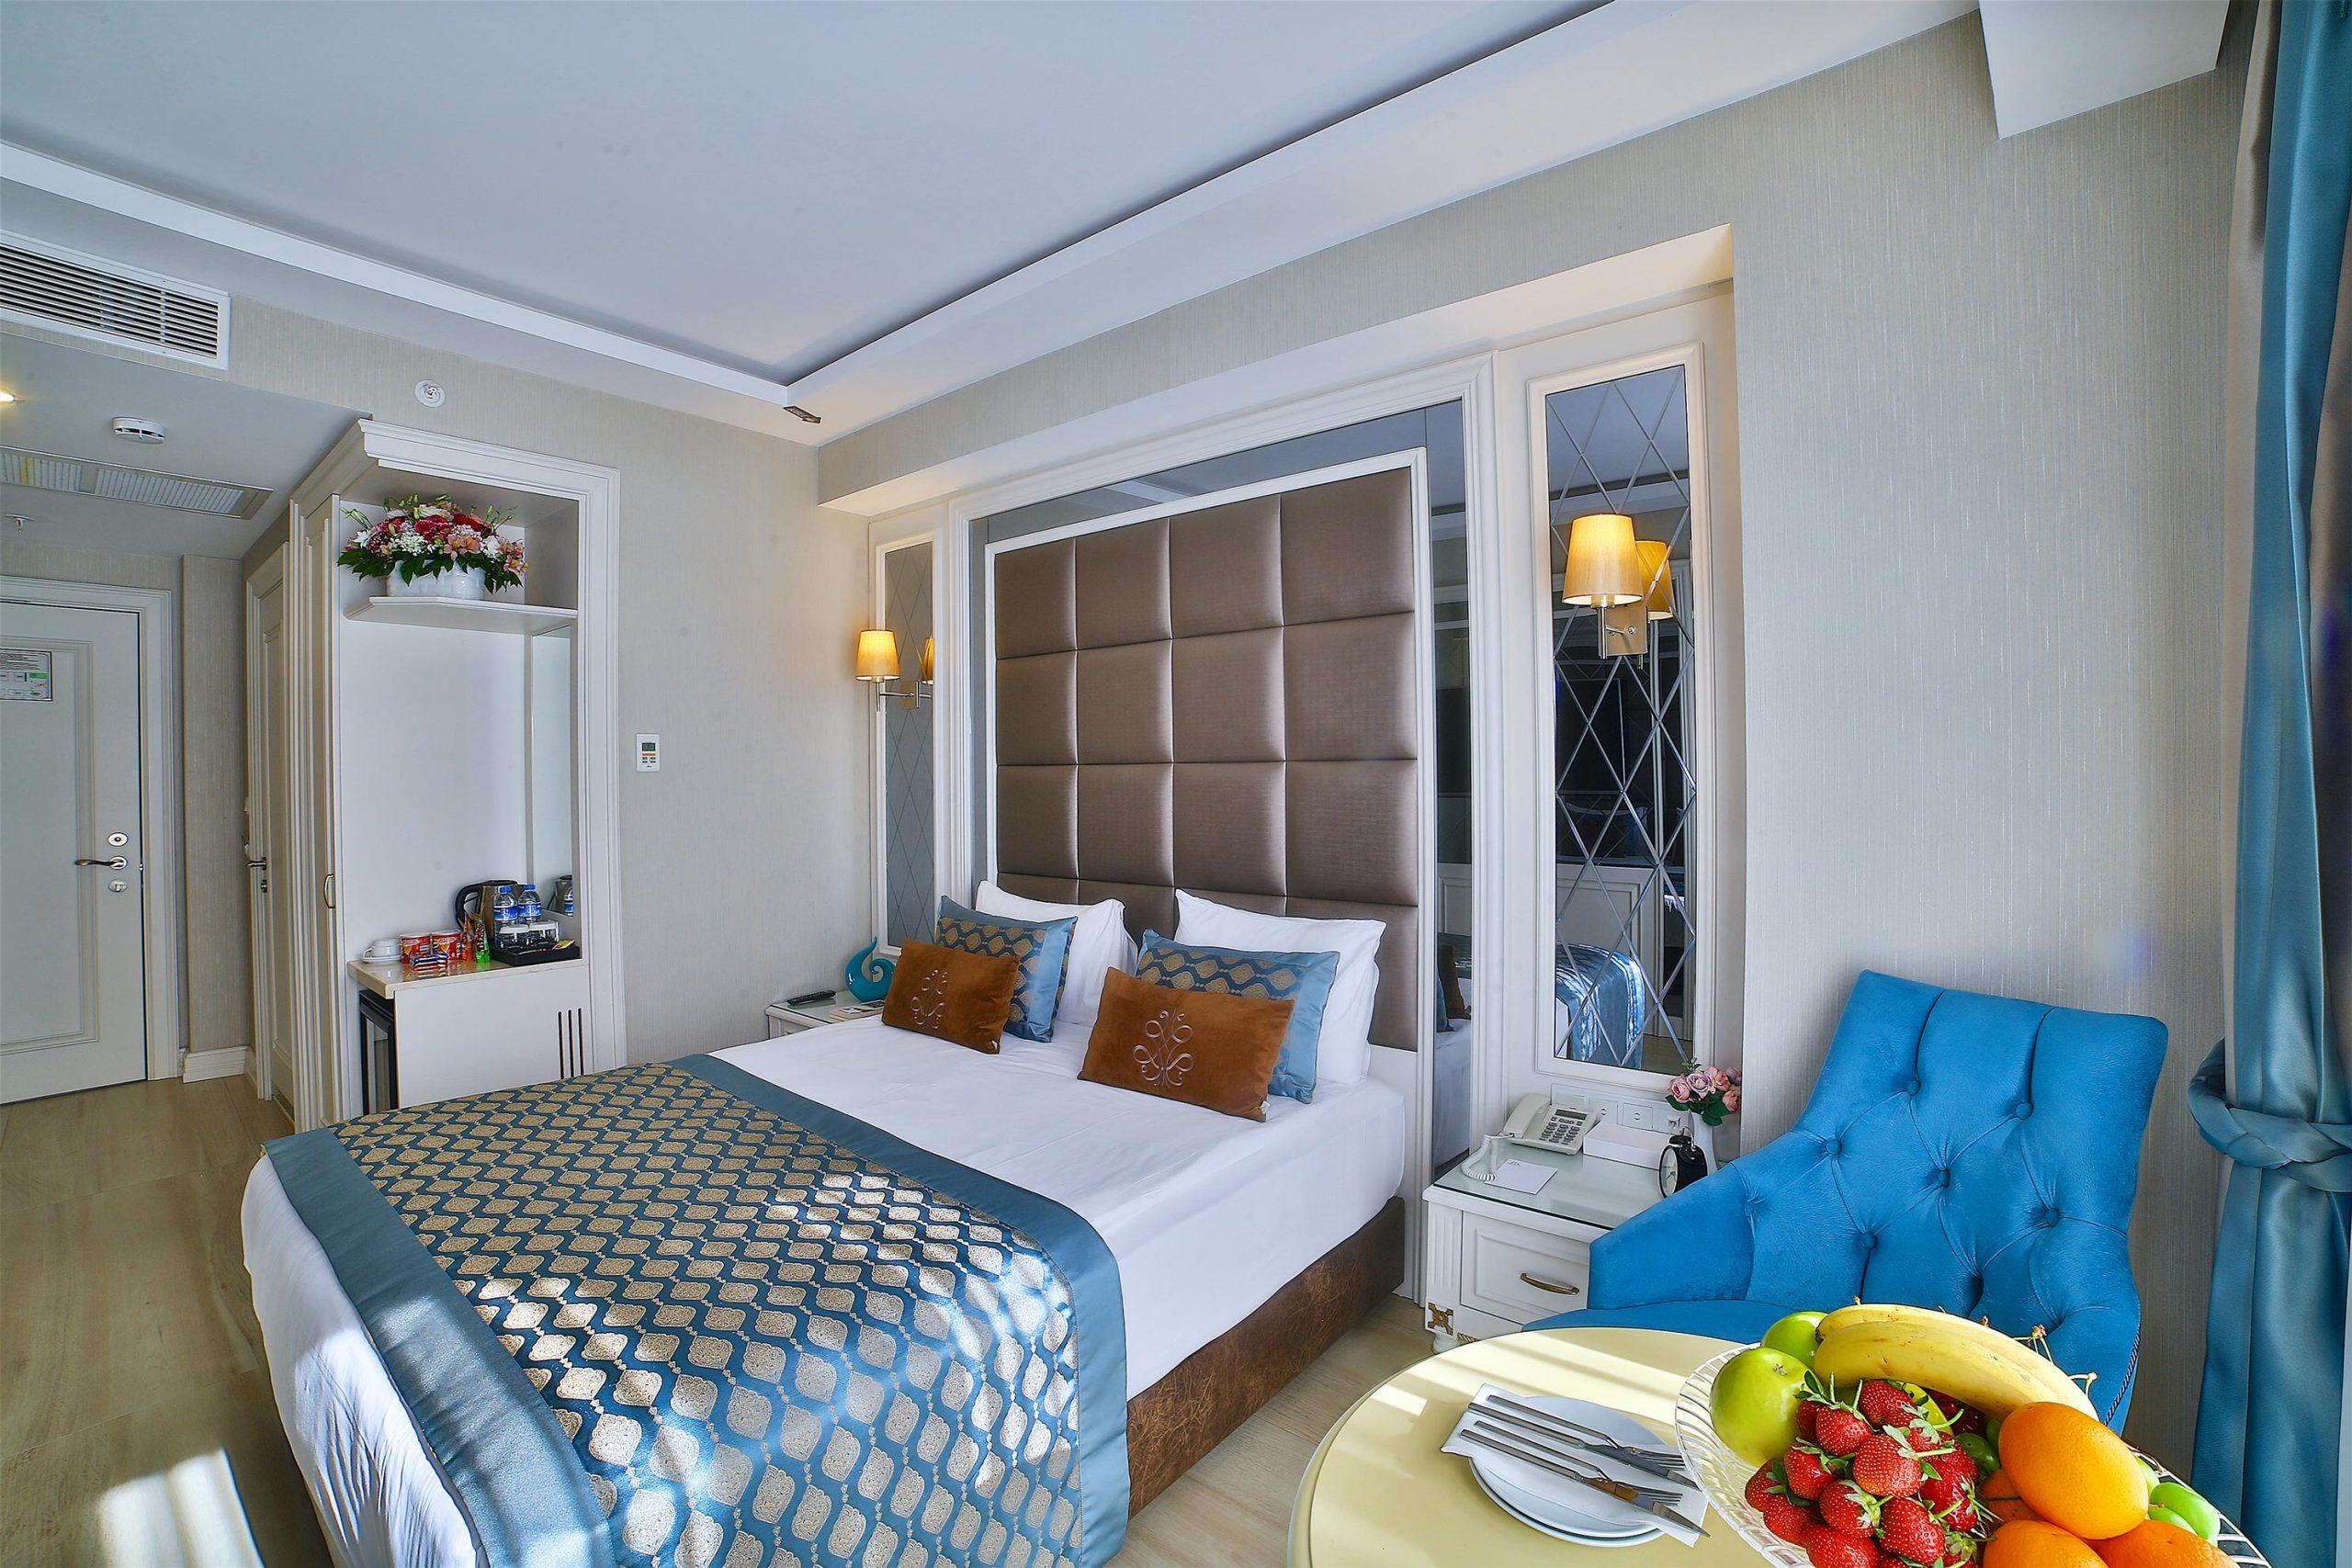 Buke Hotel - Deluxe Double Room